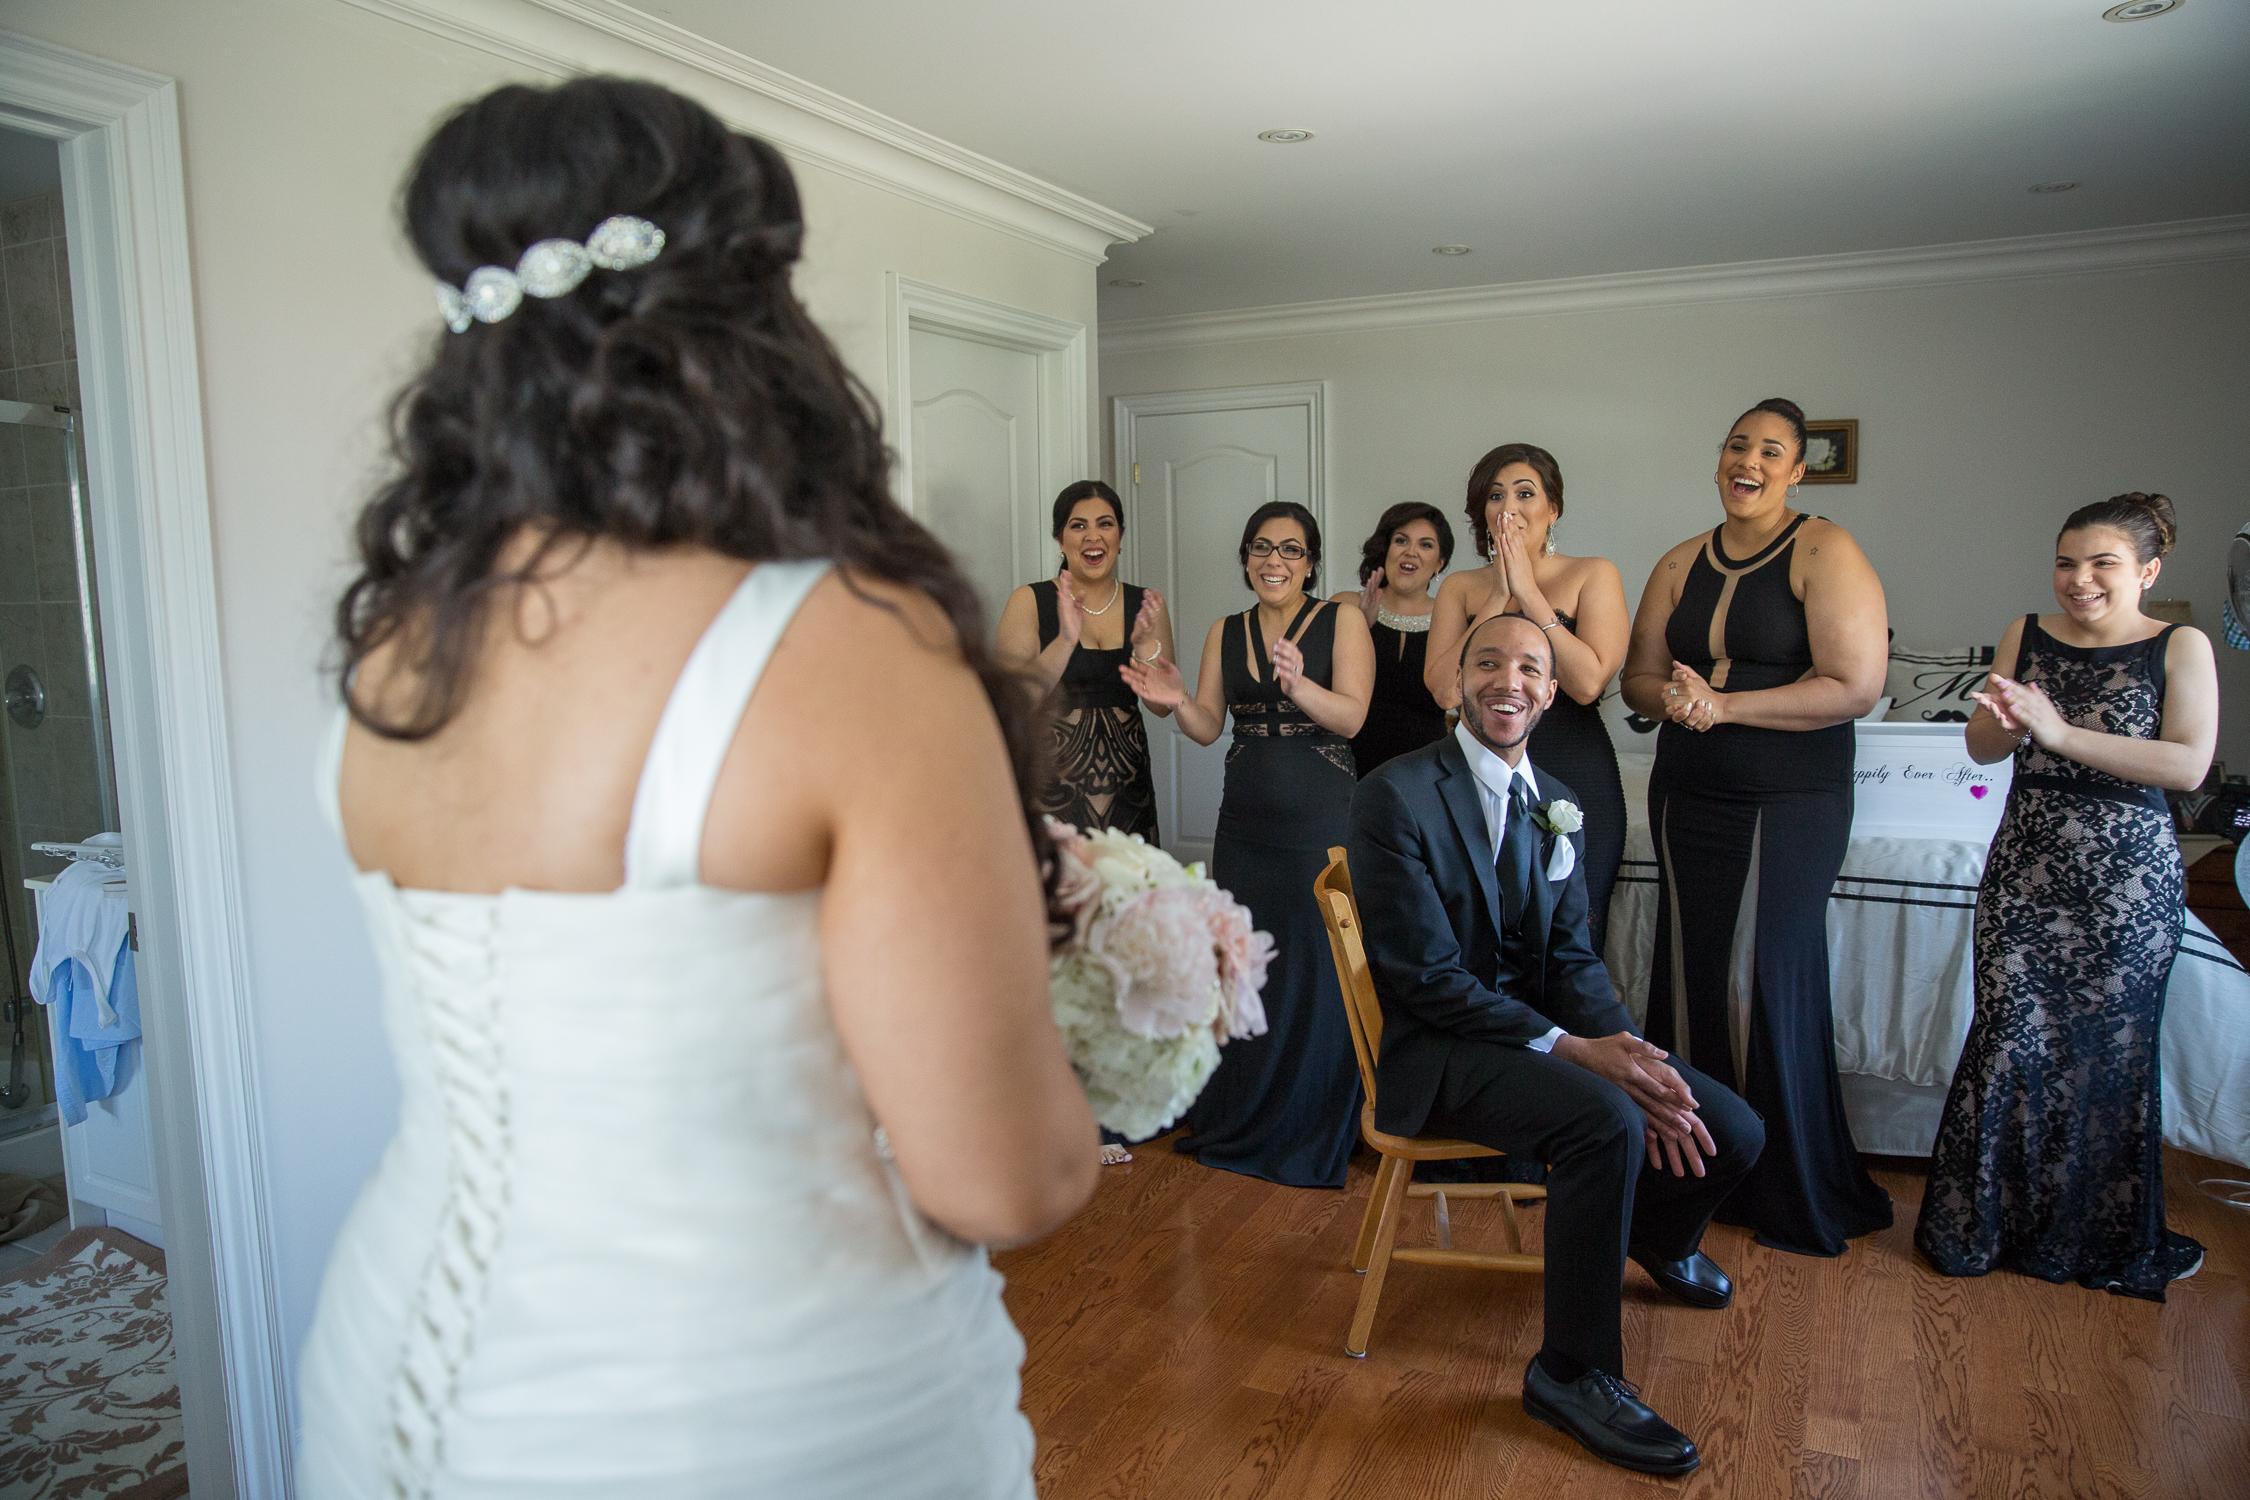 Peter-and-Marie-Wedding-Fontana-Primavera-Graydon-Hall-Manor-Toronto-Ontario-Canada-0012.jpg